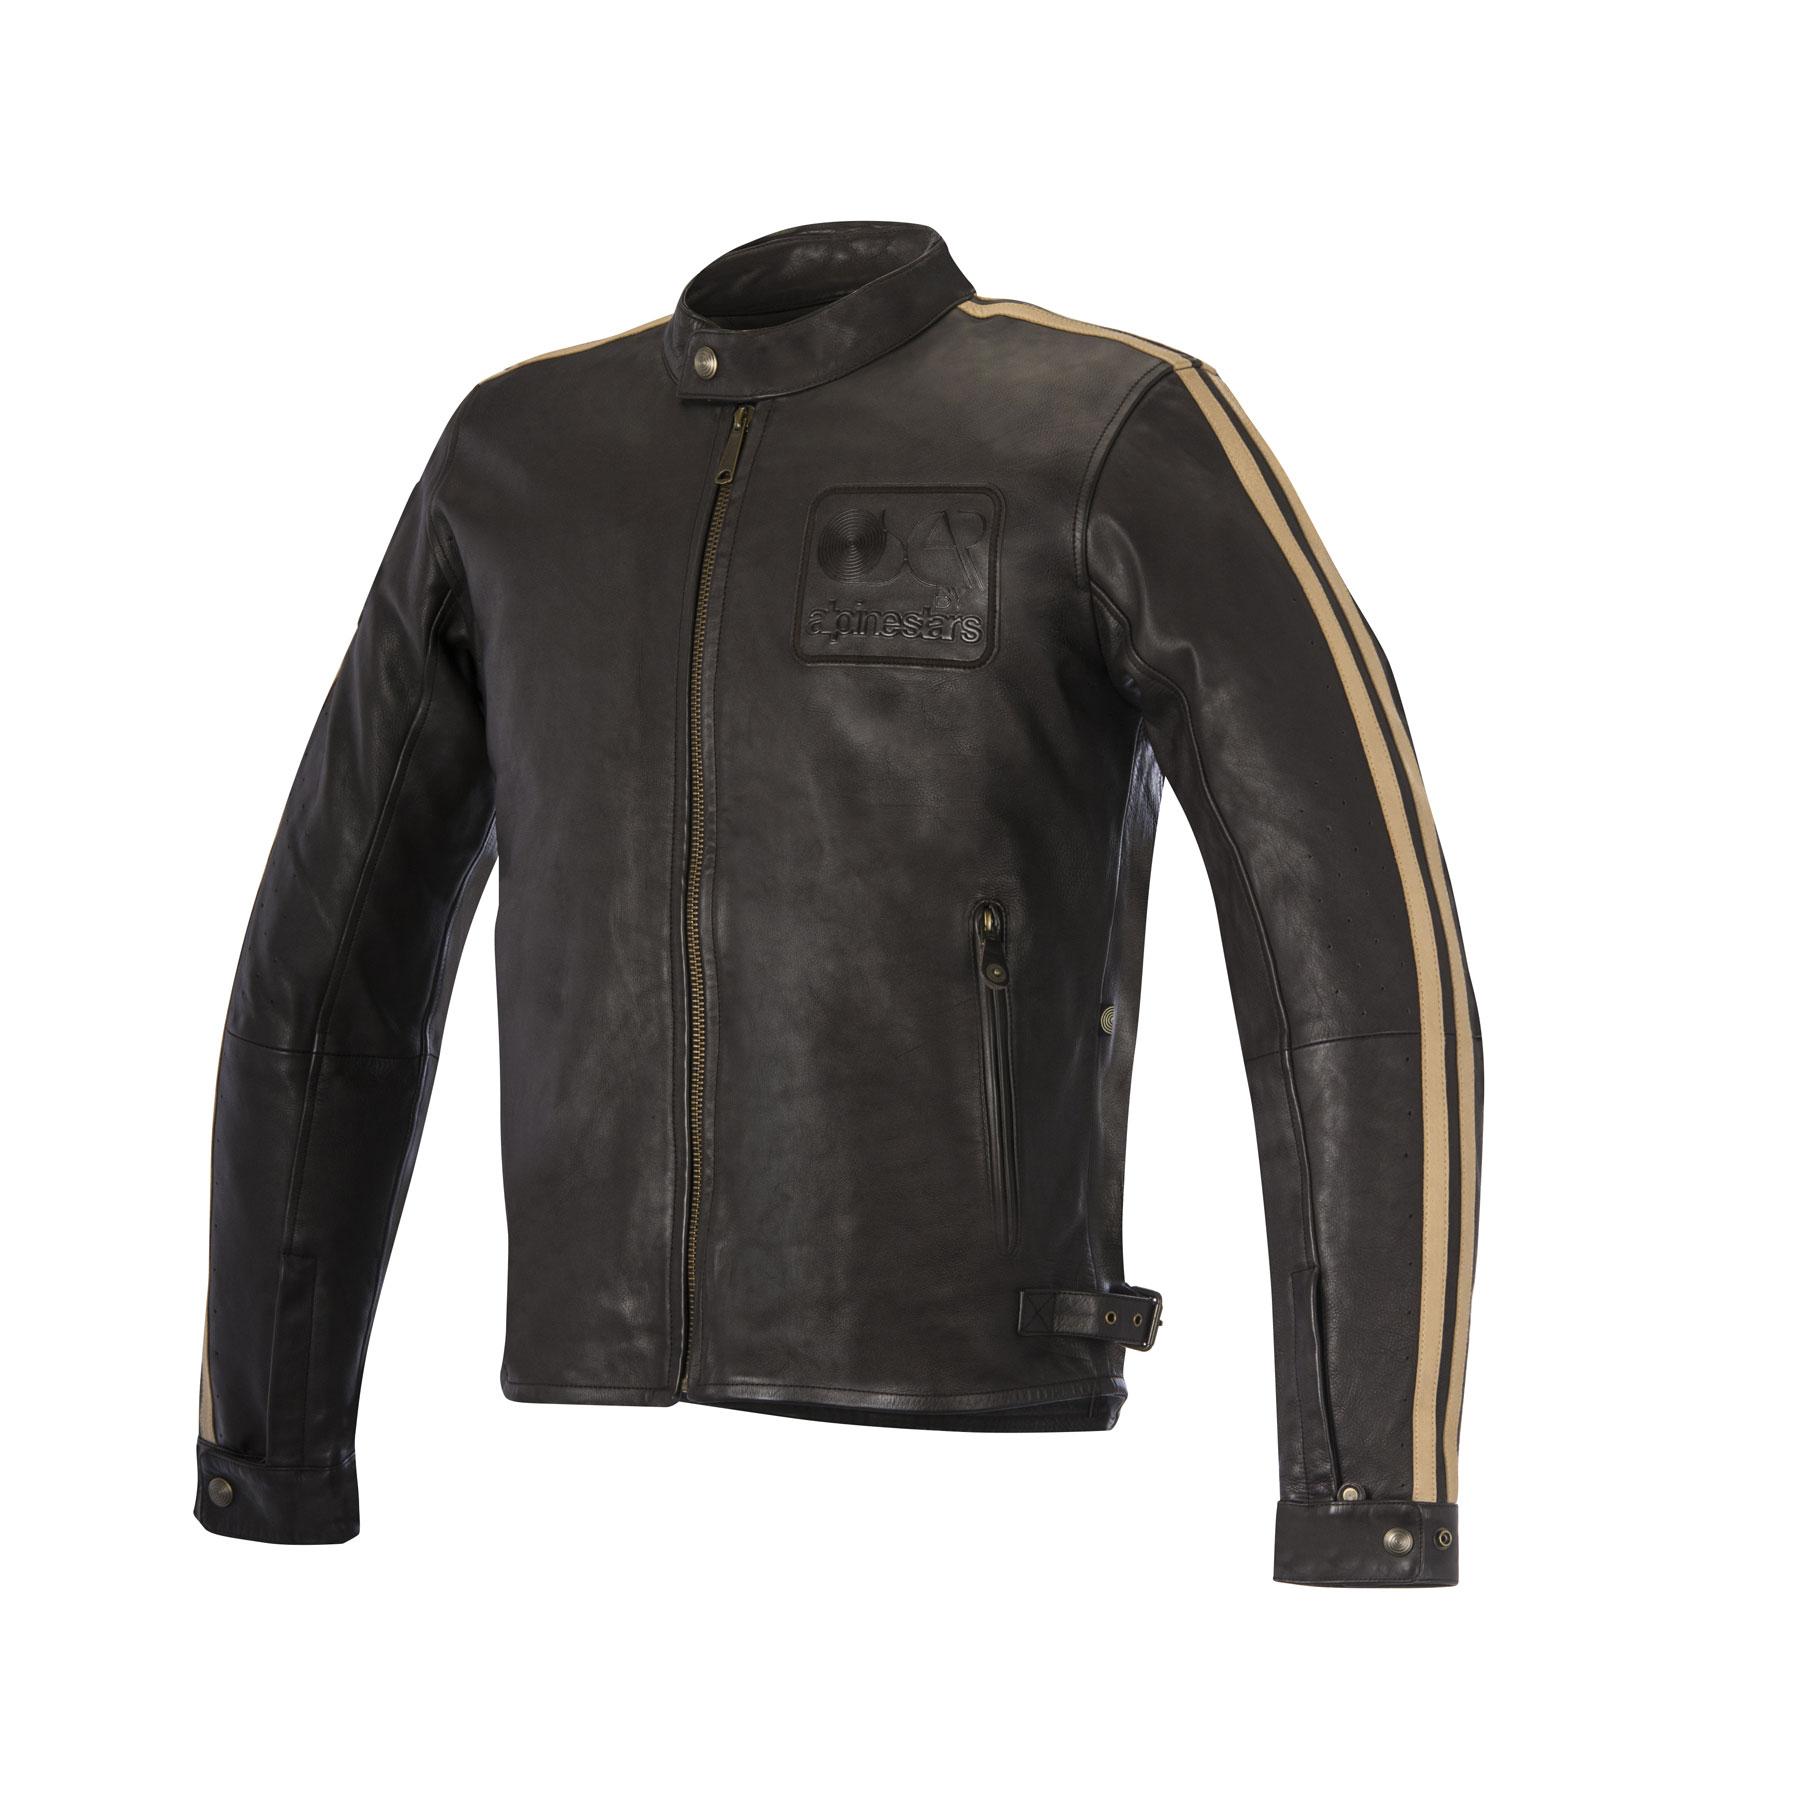 Alpinestars Oscar CHARLIE Leather Street Motorcycle Jacket (Brown)